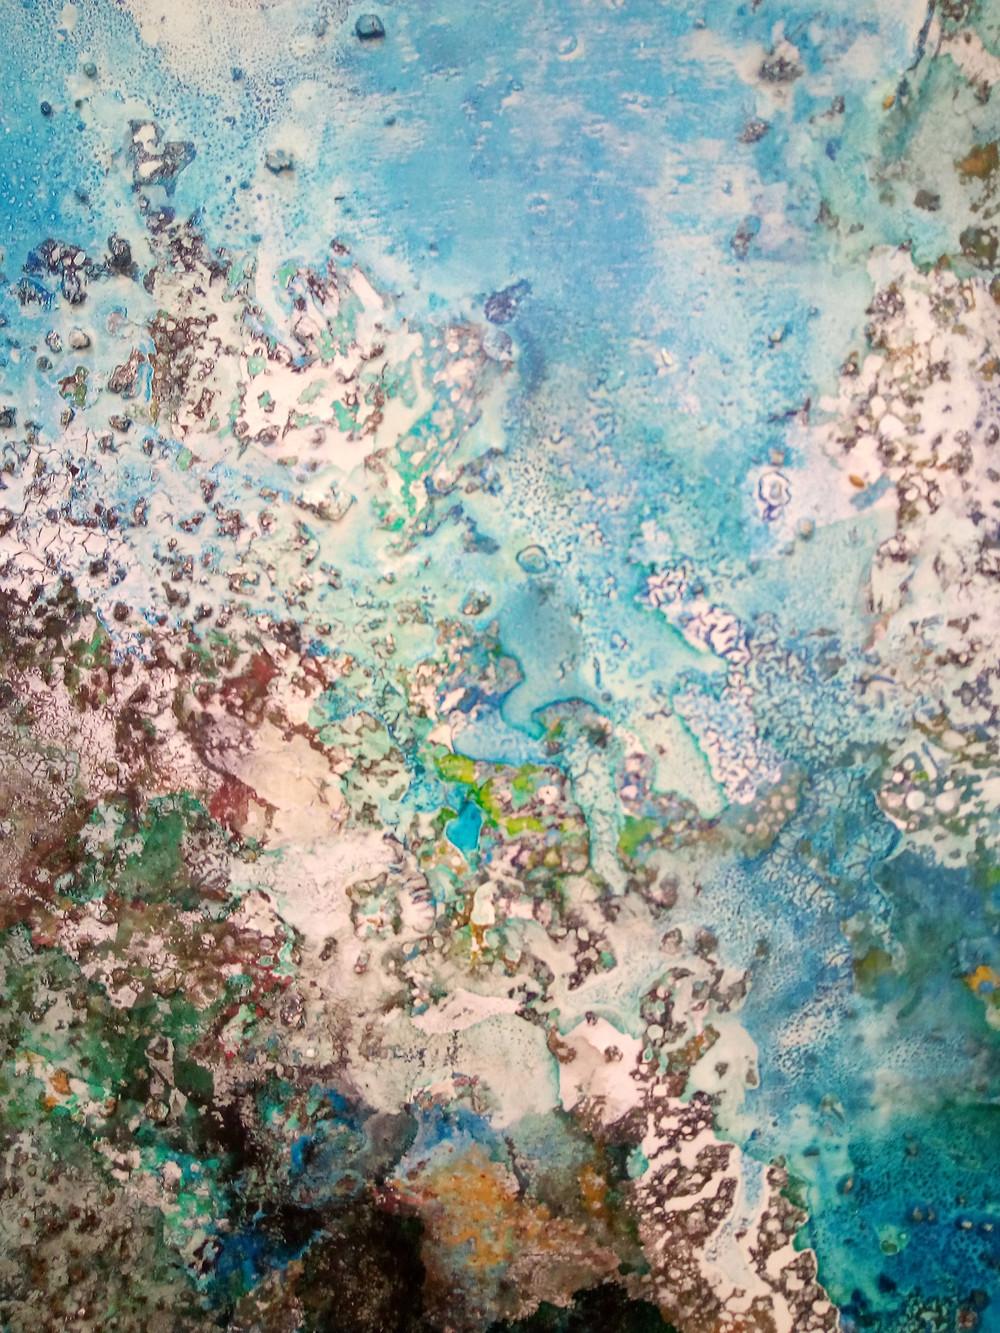 Mixed Media on Canvas 100cm x 100cm